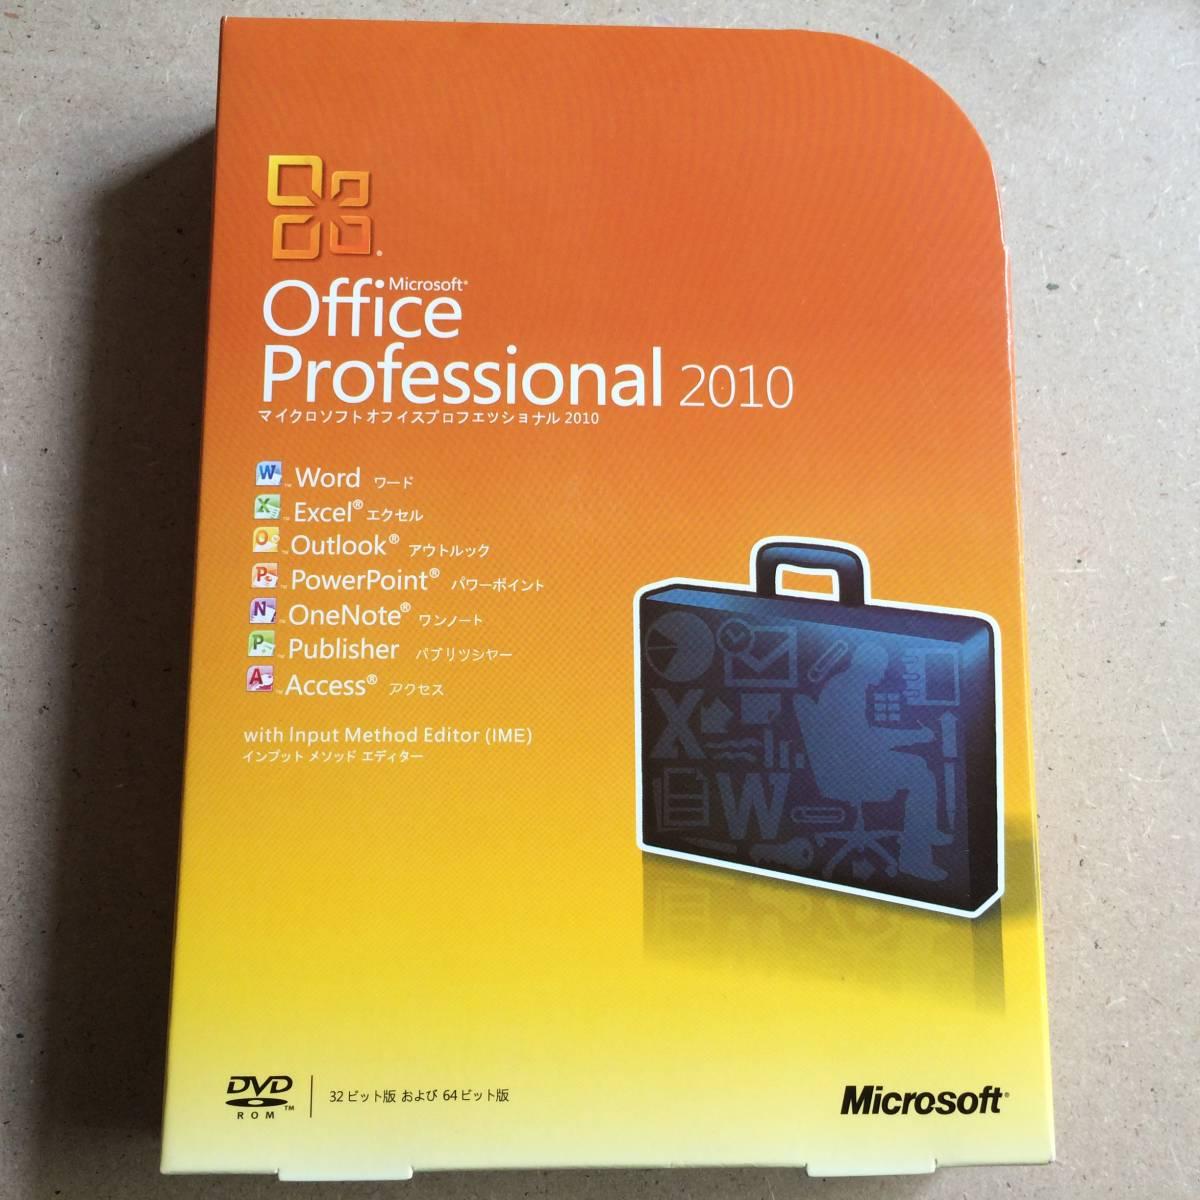 新品未開封 Microsoft Office Professional 2010 JP 341